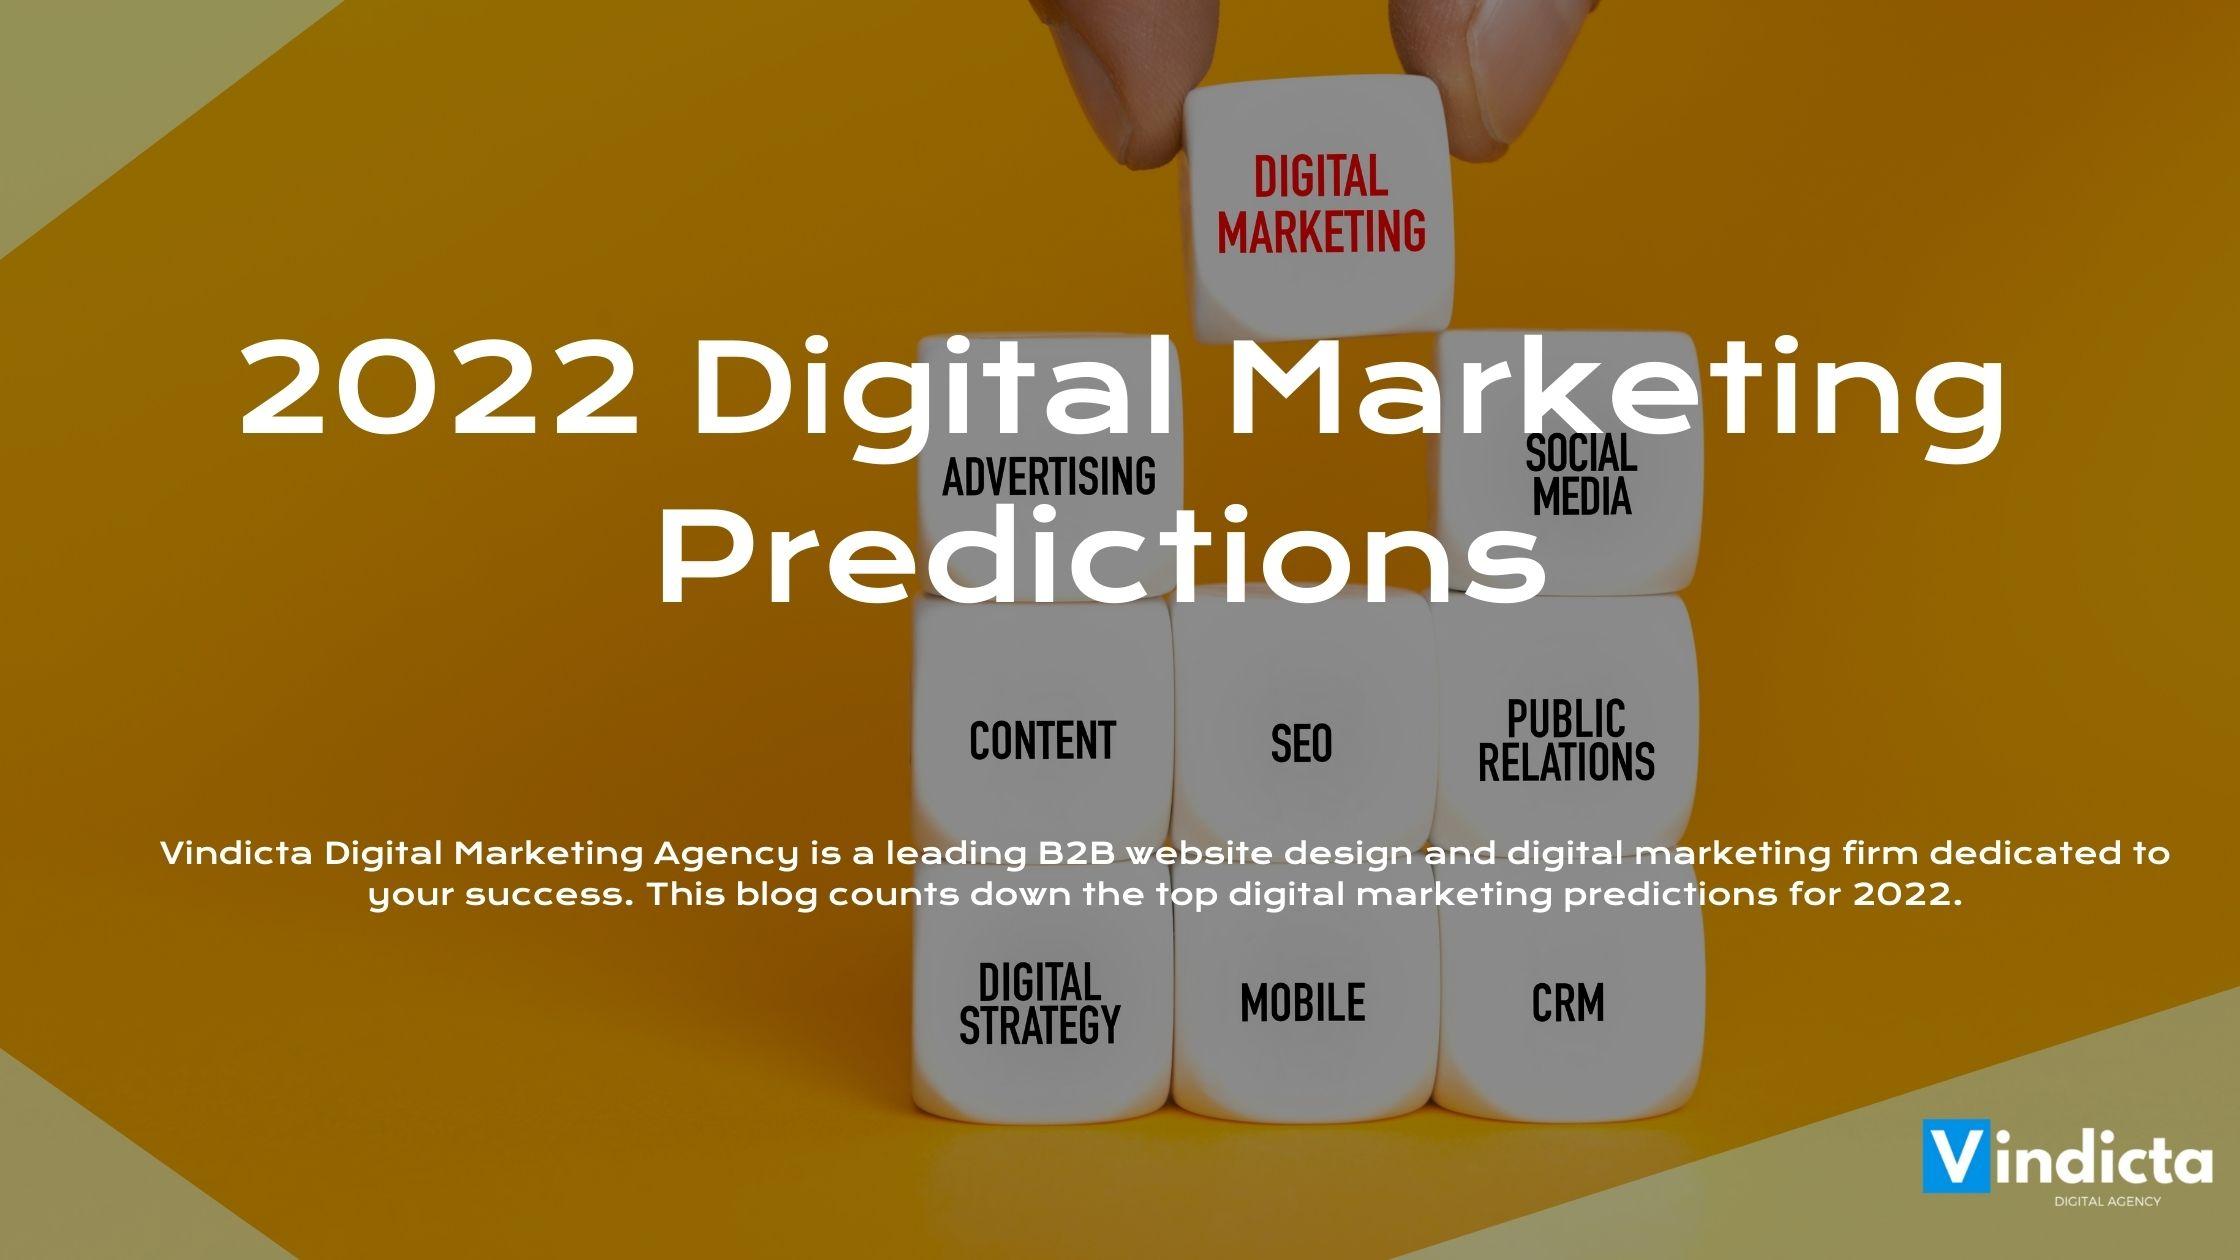 2022 Digital Marketing Predictions